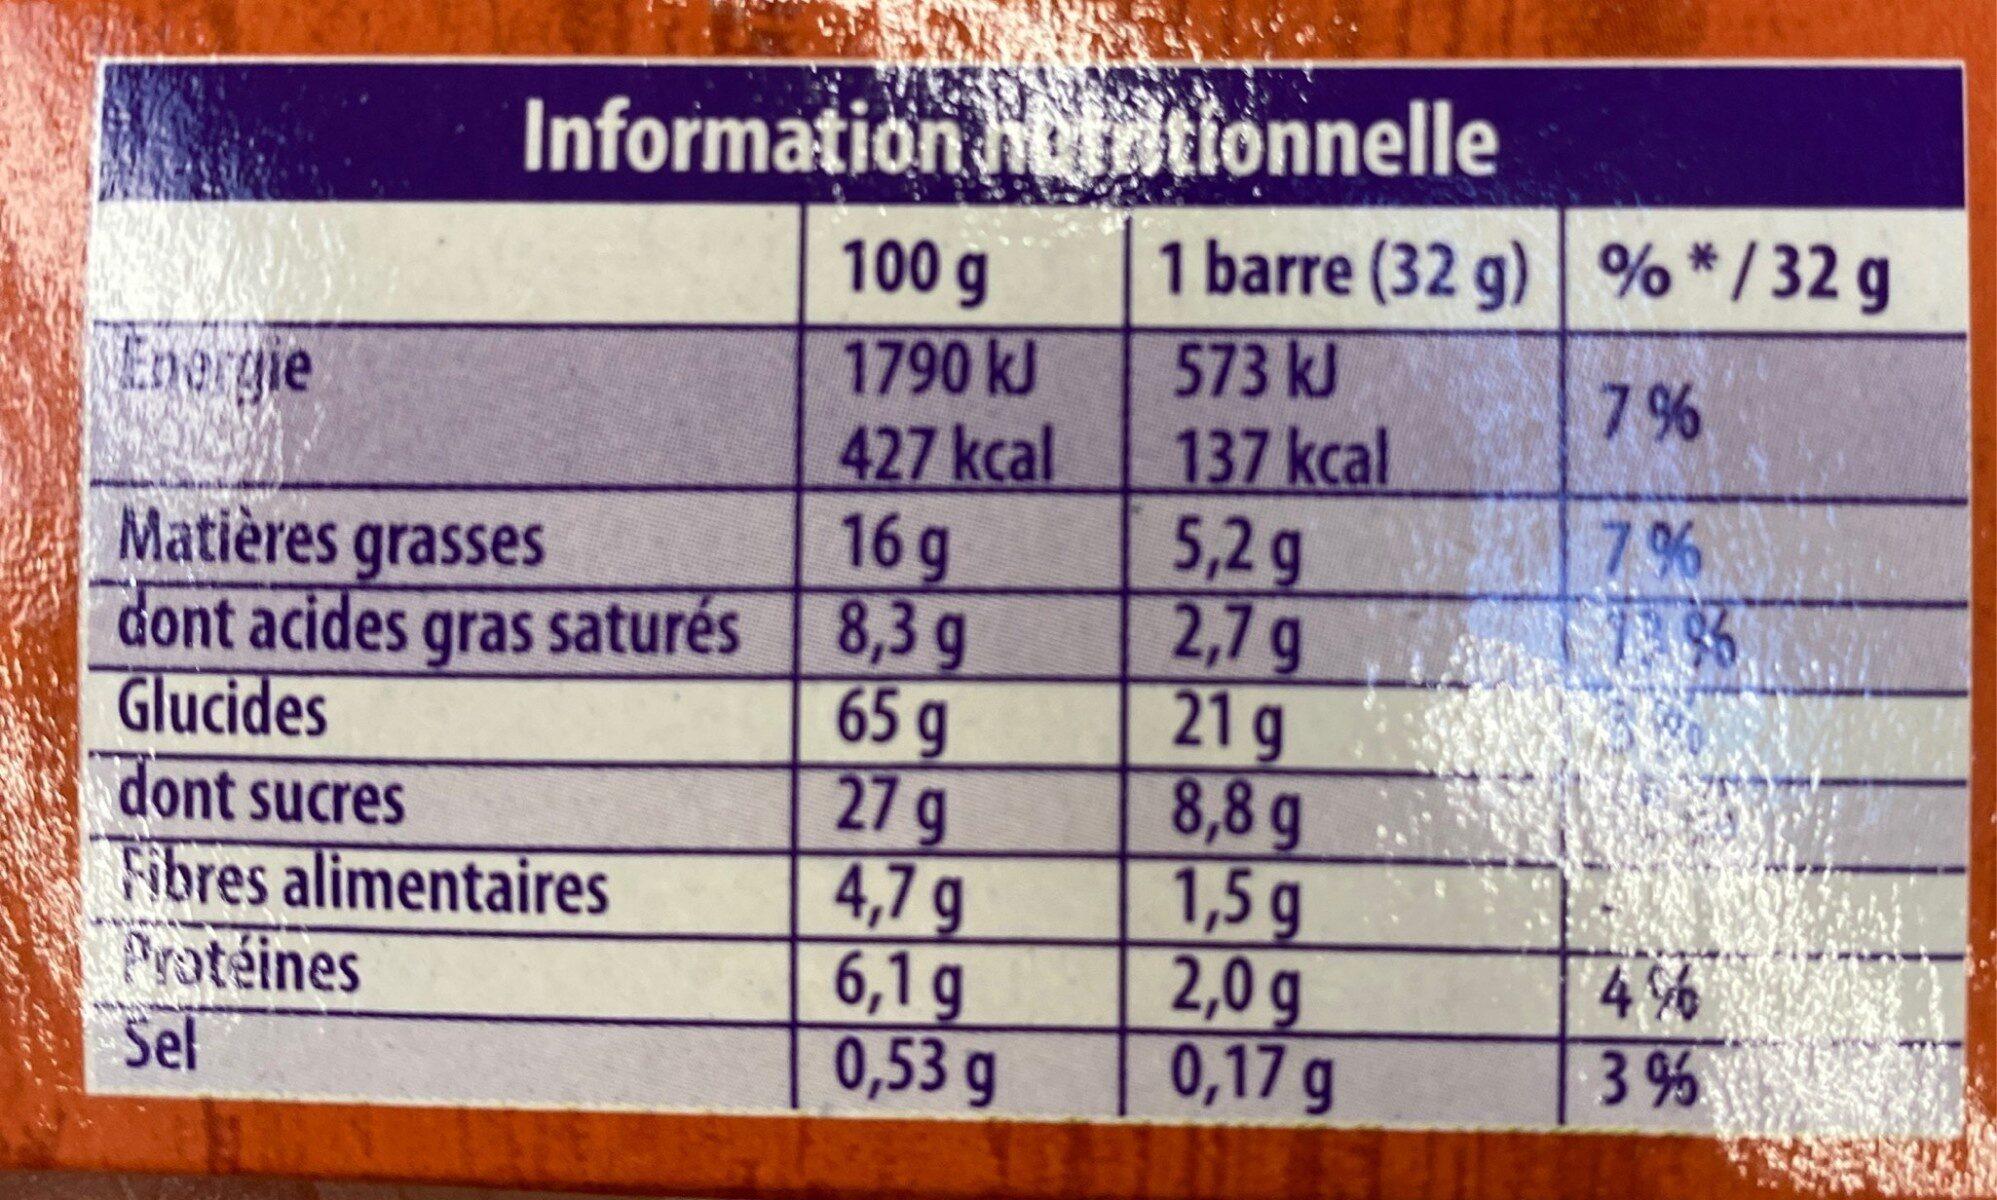 Brunch Bar Chocolat au lait - Valori nutrizionali - fr